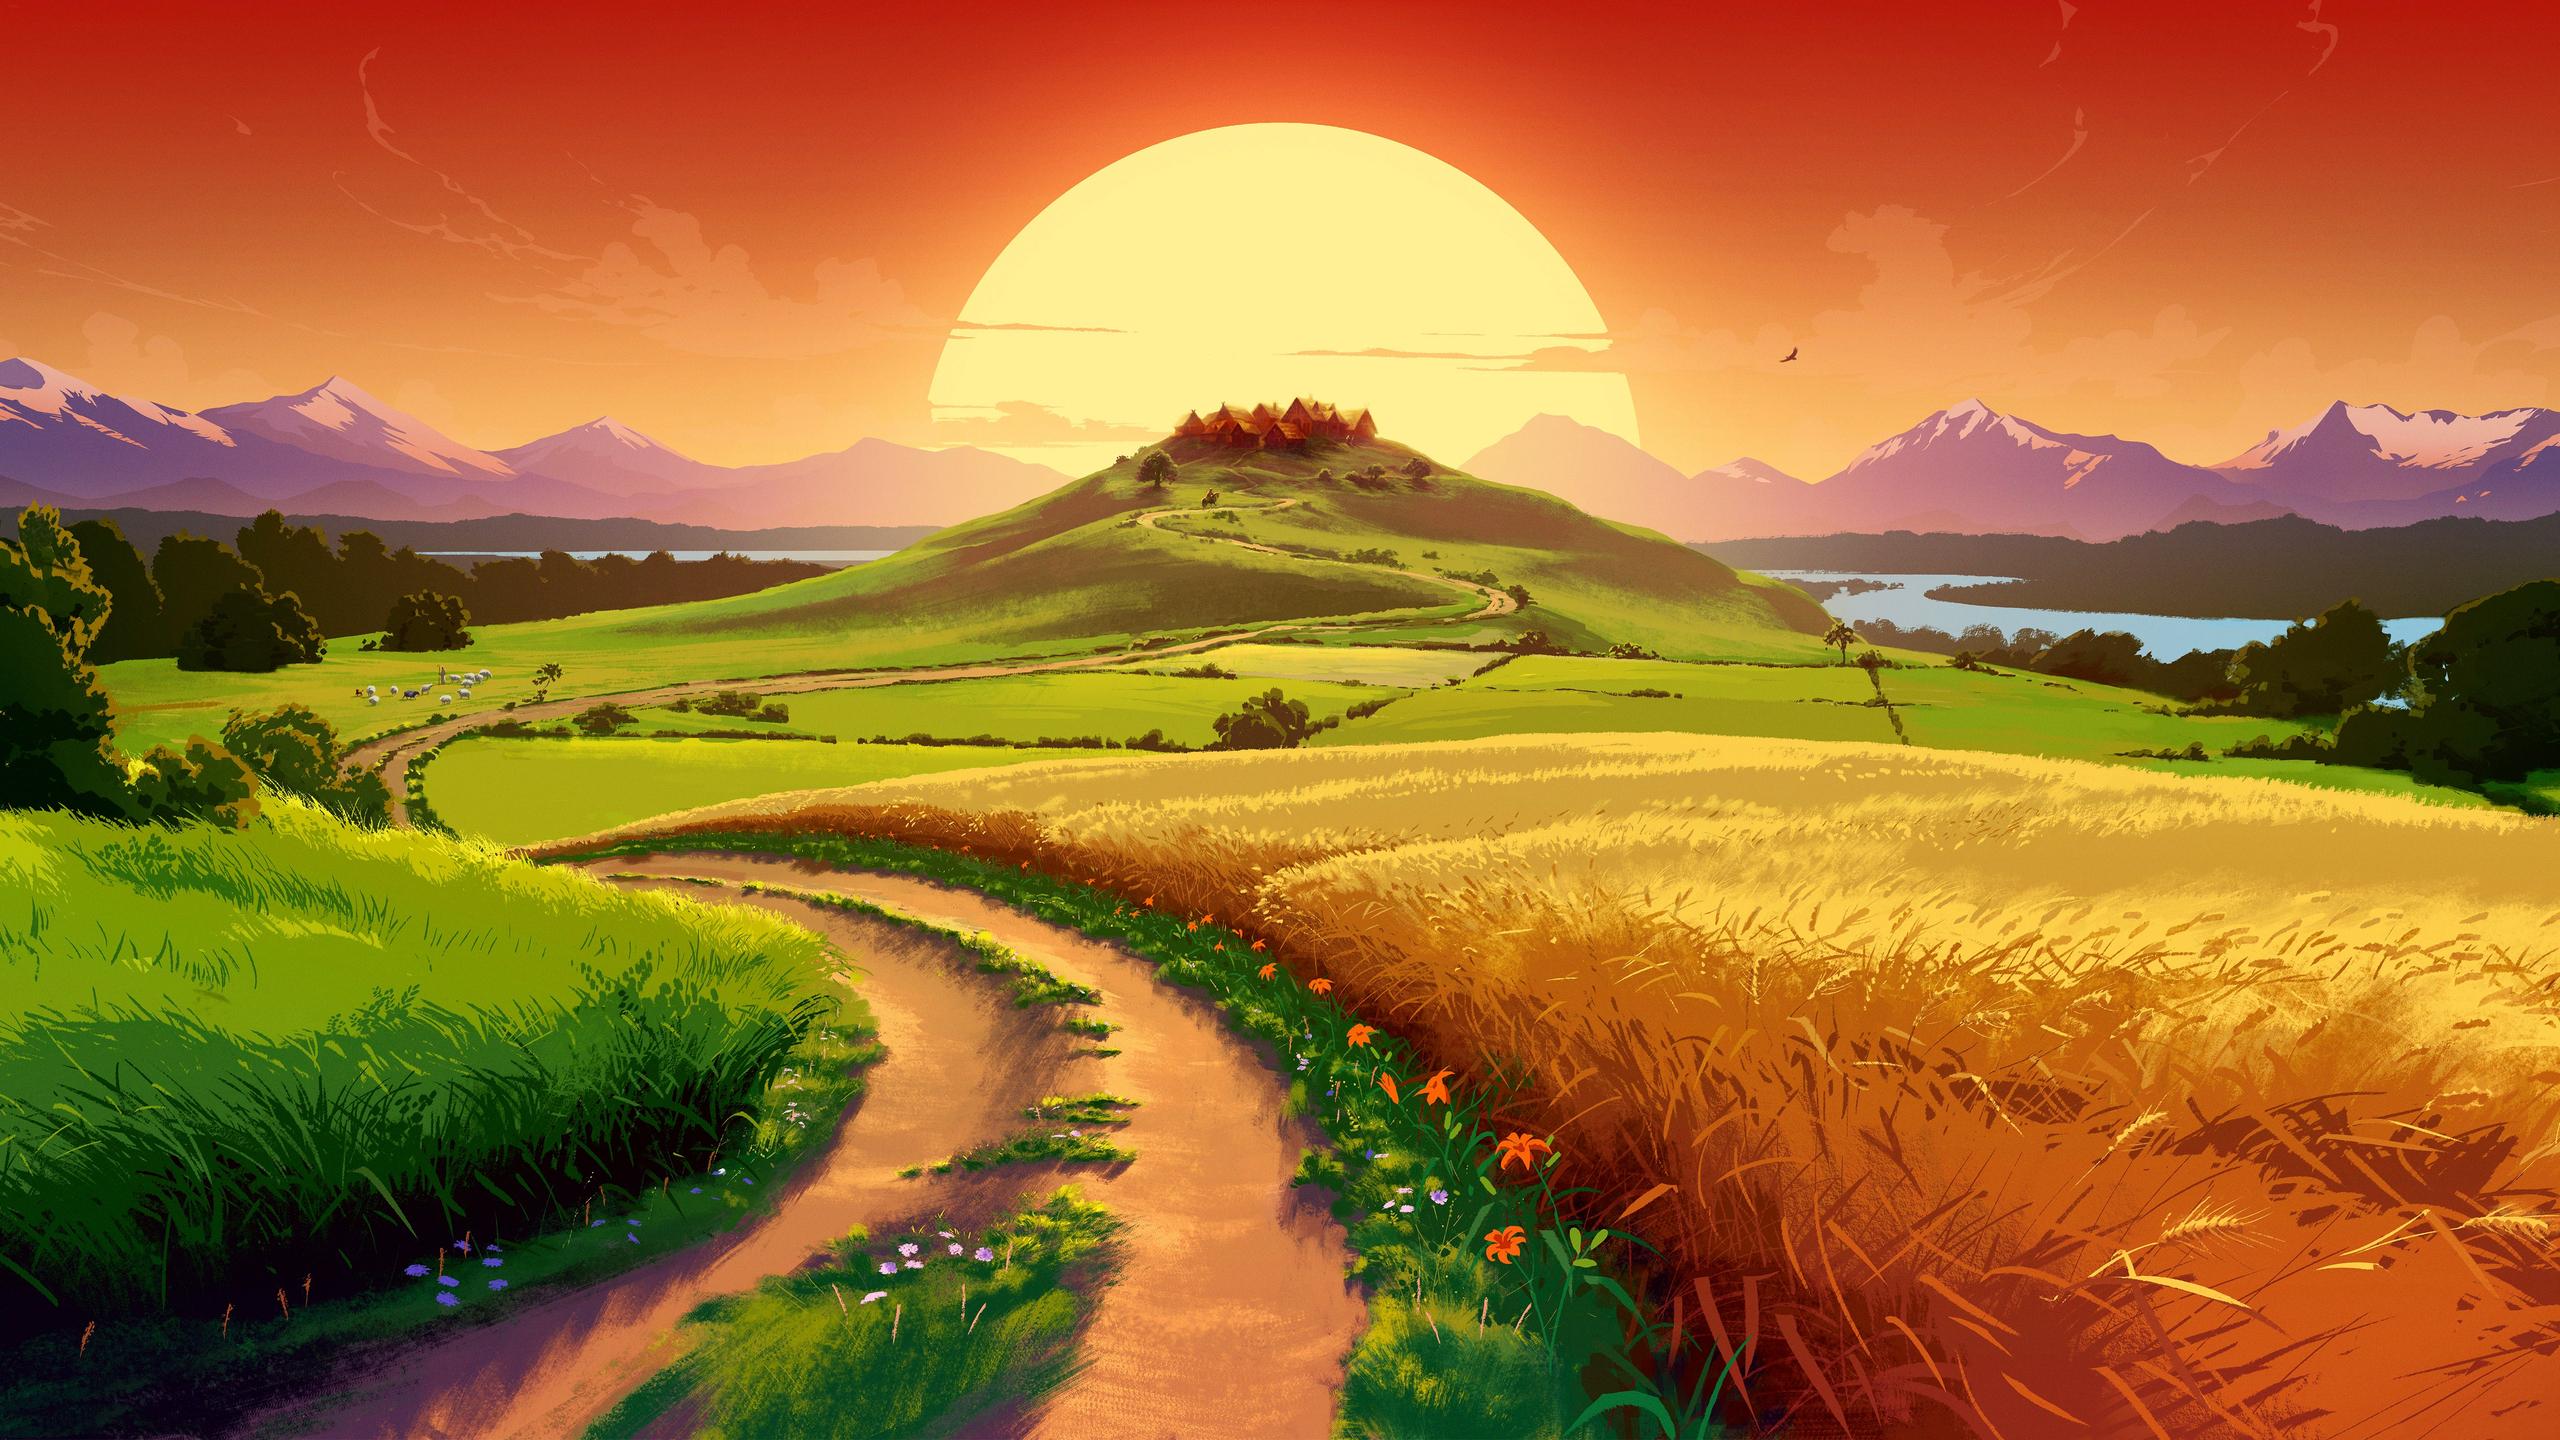 Sunset [2560x1440] Landscape wallpaper